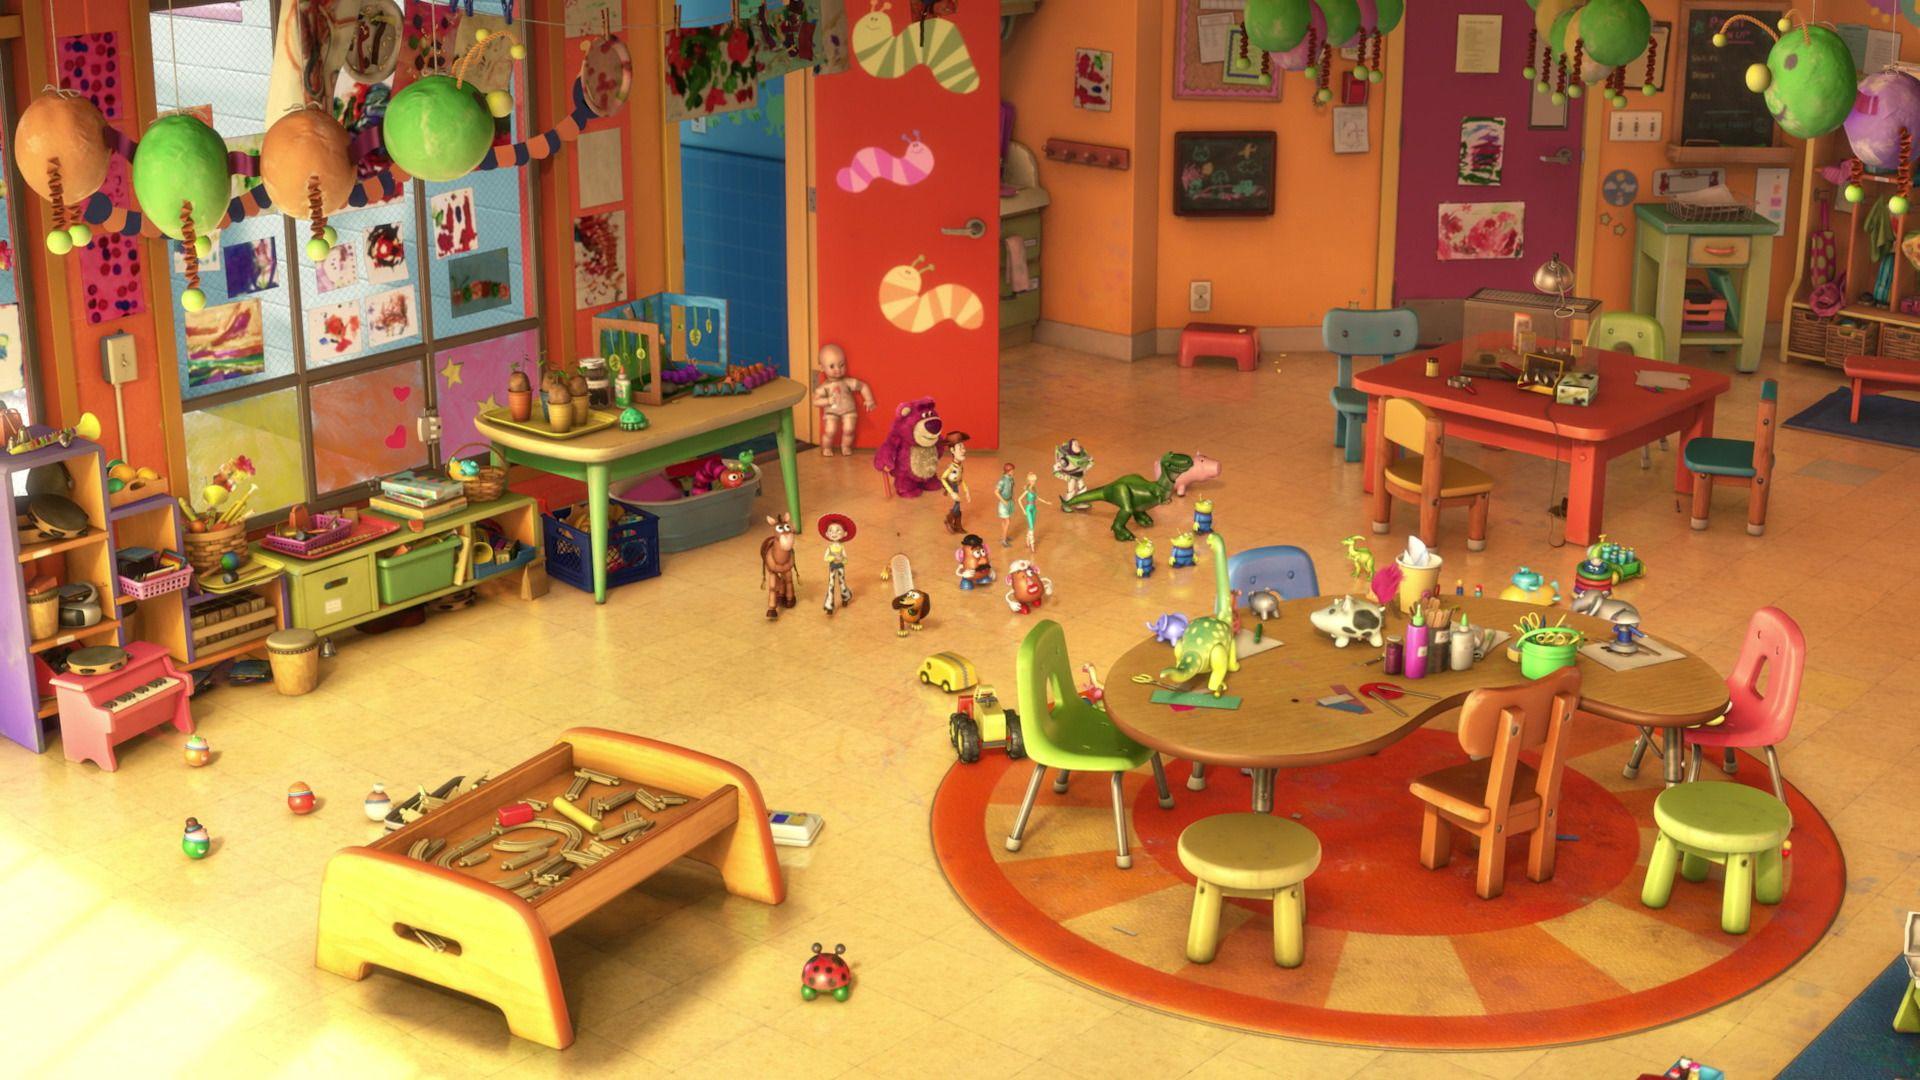 Environnement Meubles Jouets Toy Story3 Disneyscreencaps